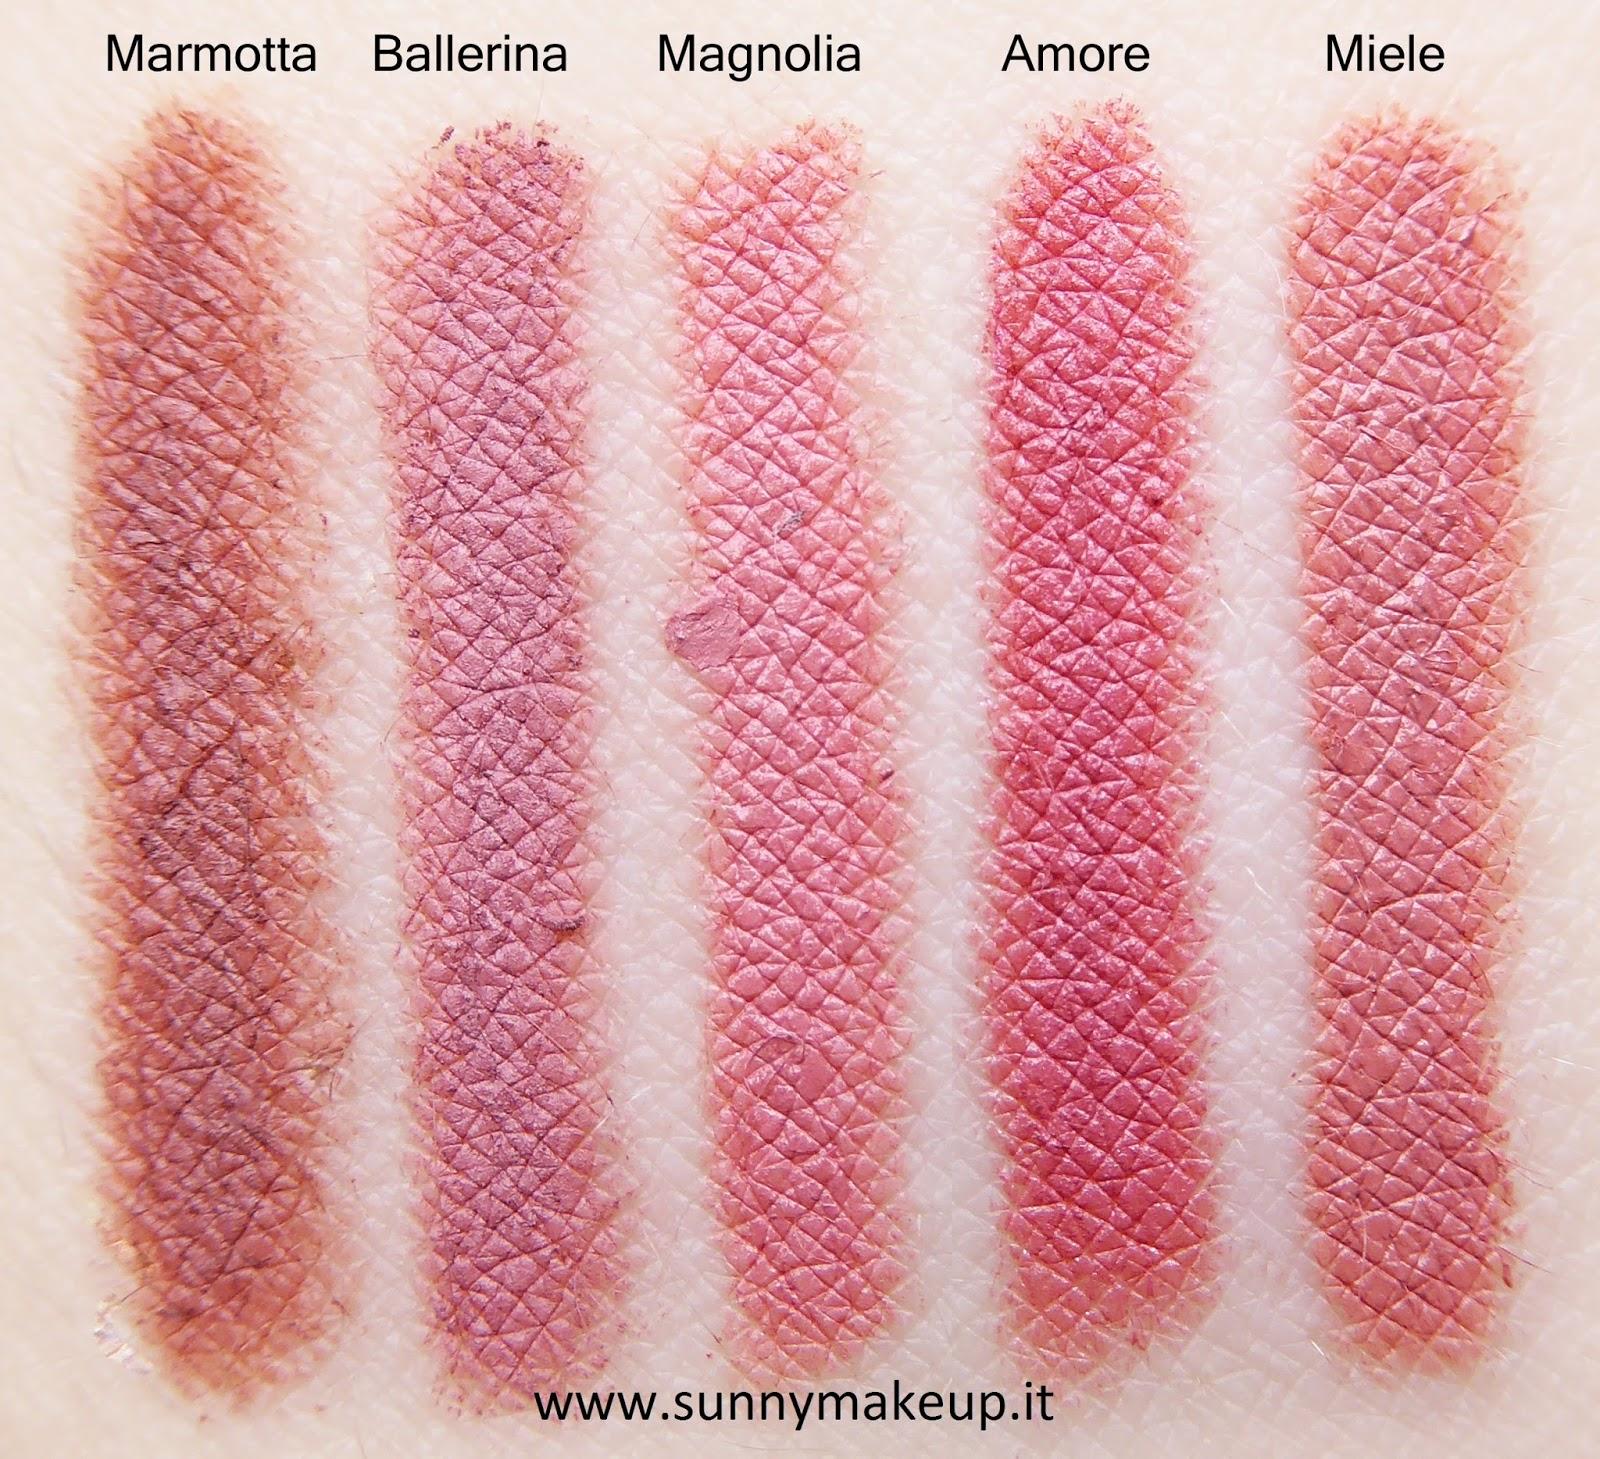 Swatch comparativi Neve Cosmetics - Matite Labbra Pastello